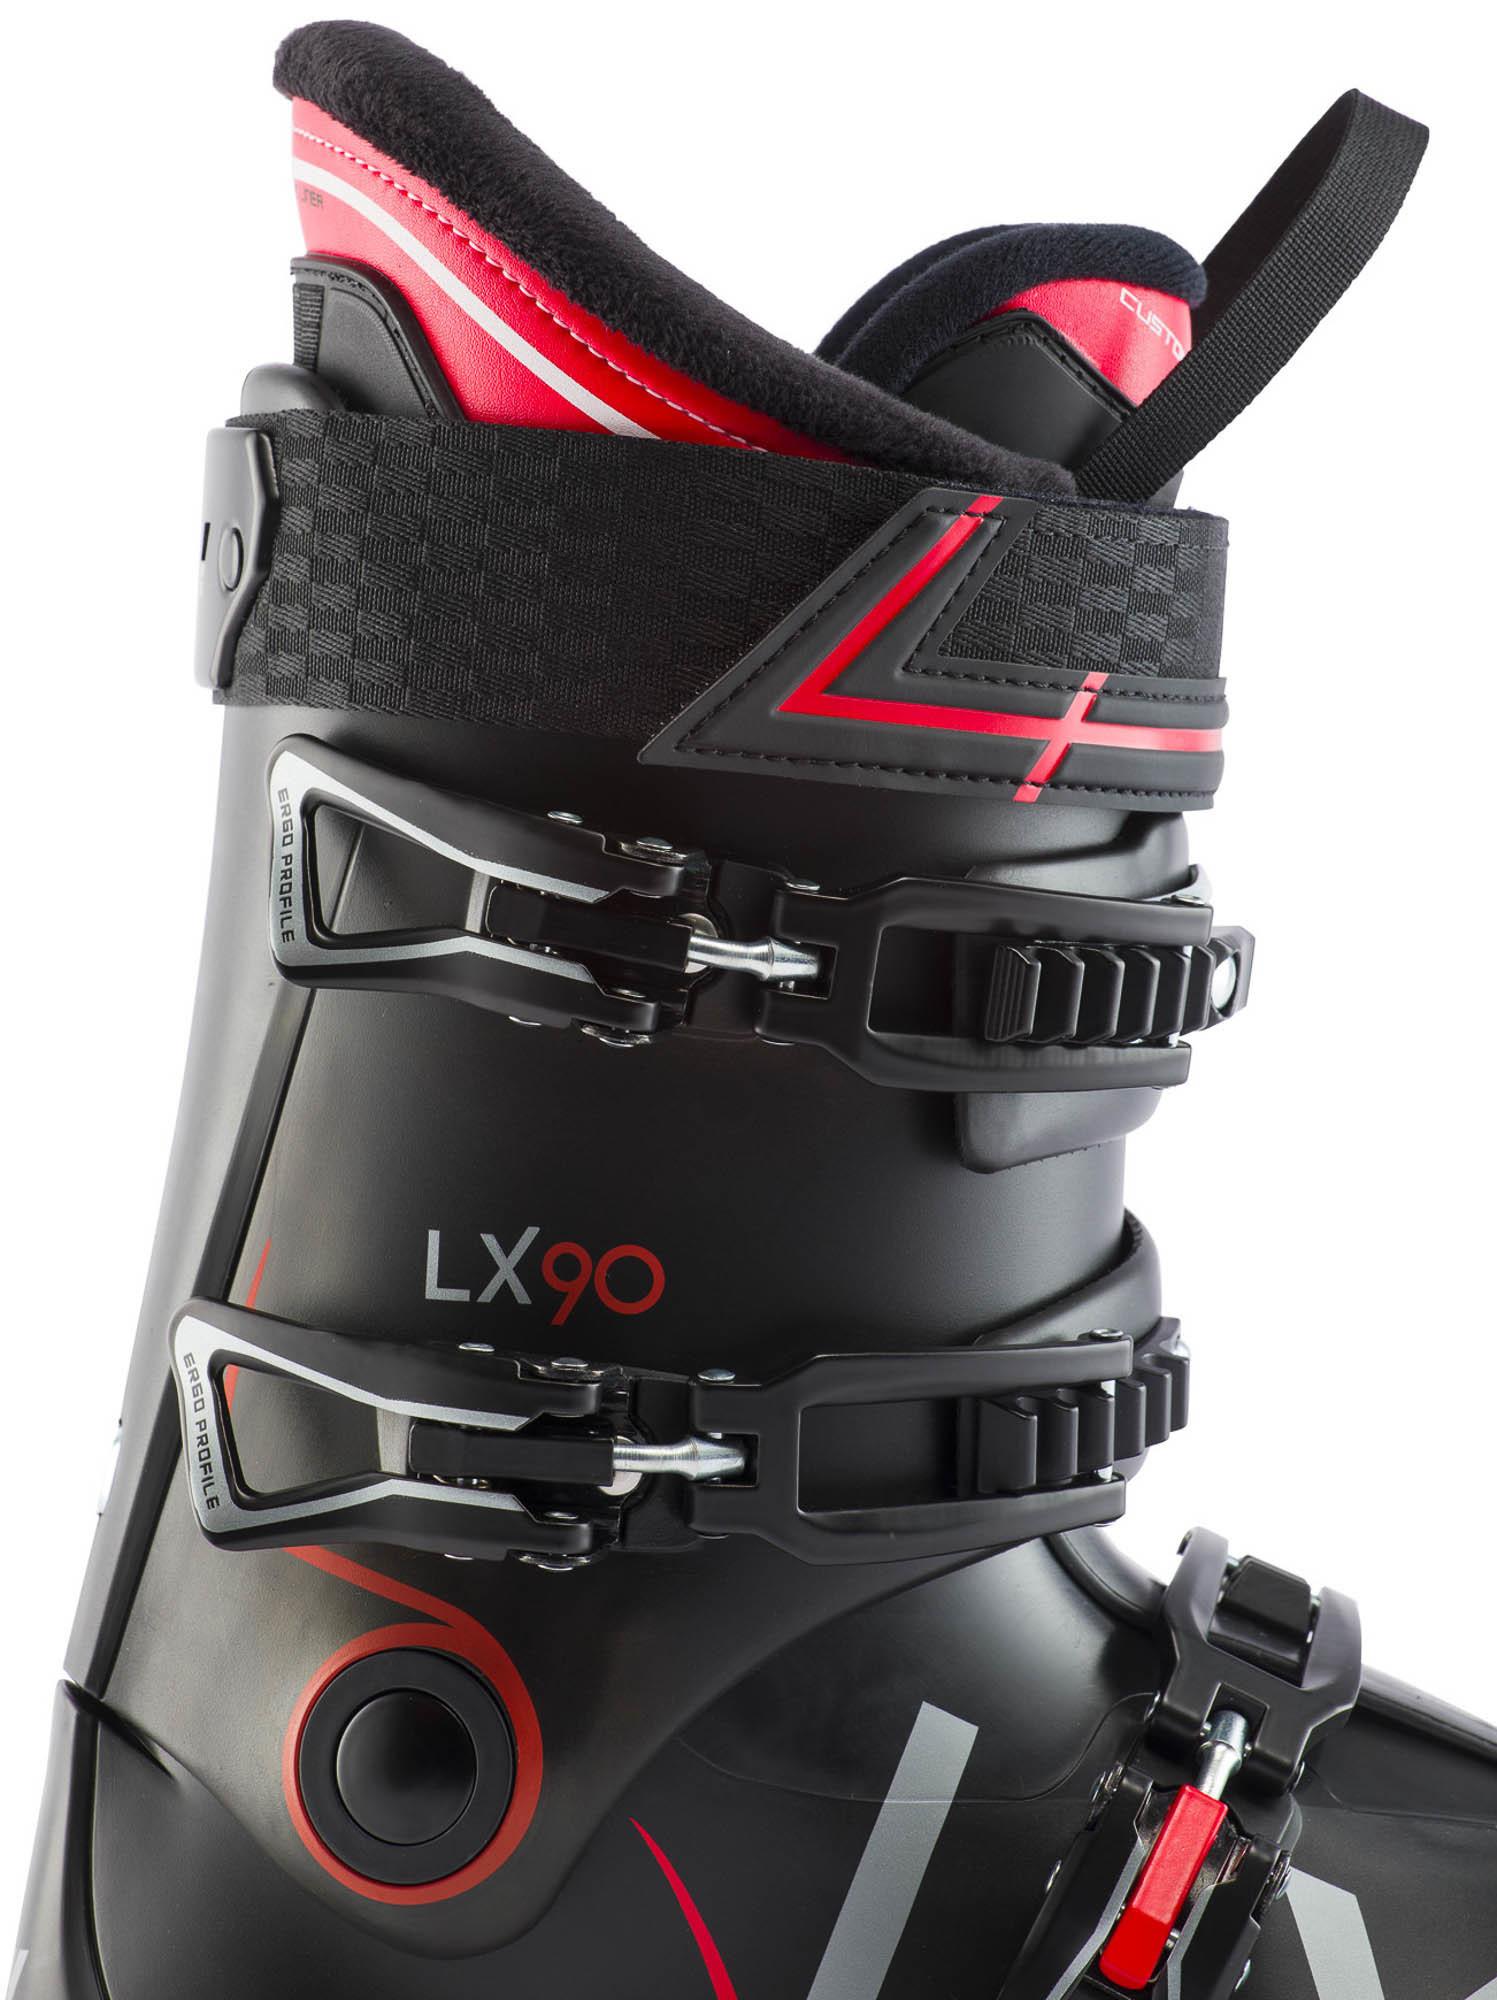 LX 90-6